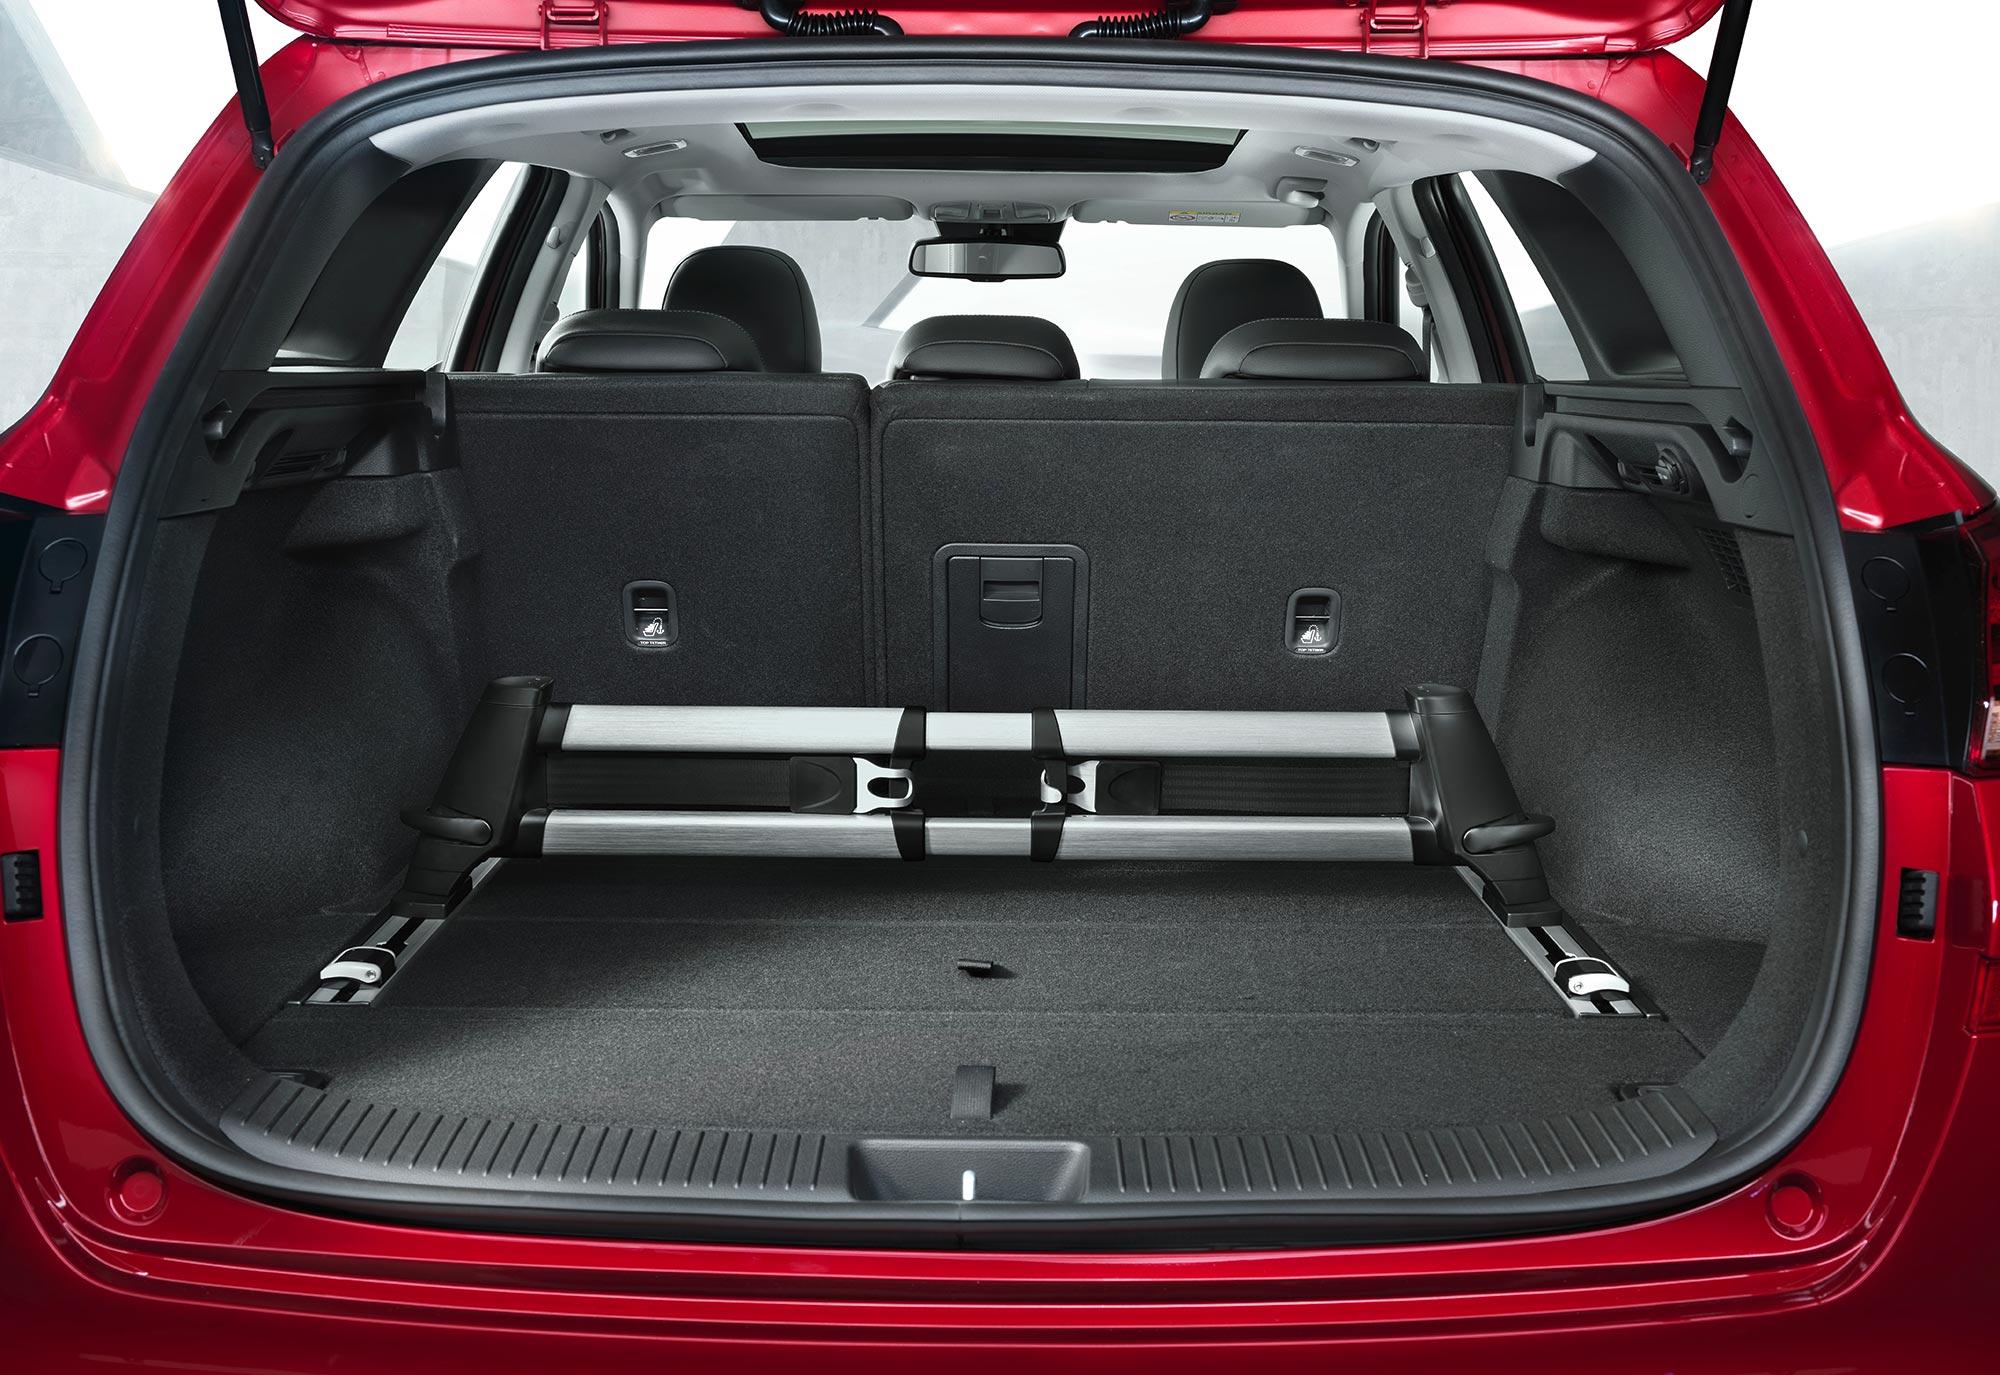 i30-wagon-interior-(6).jpg